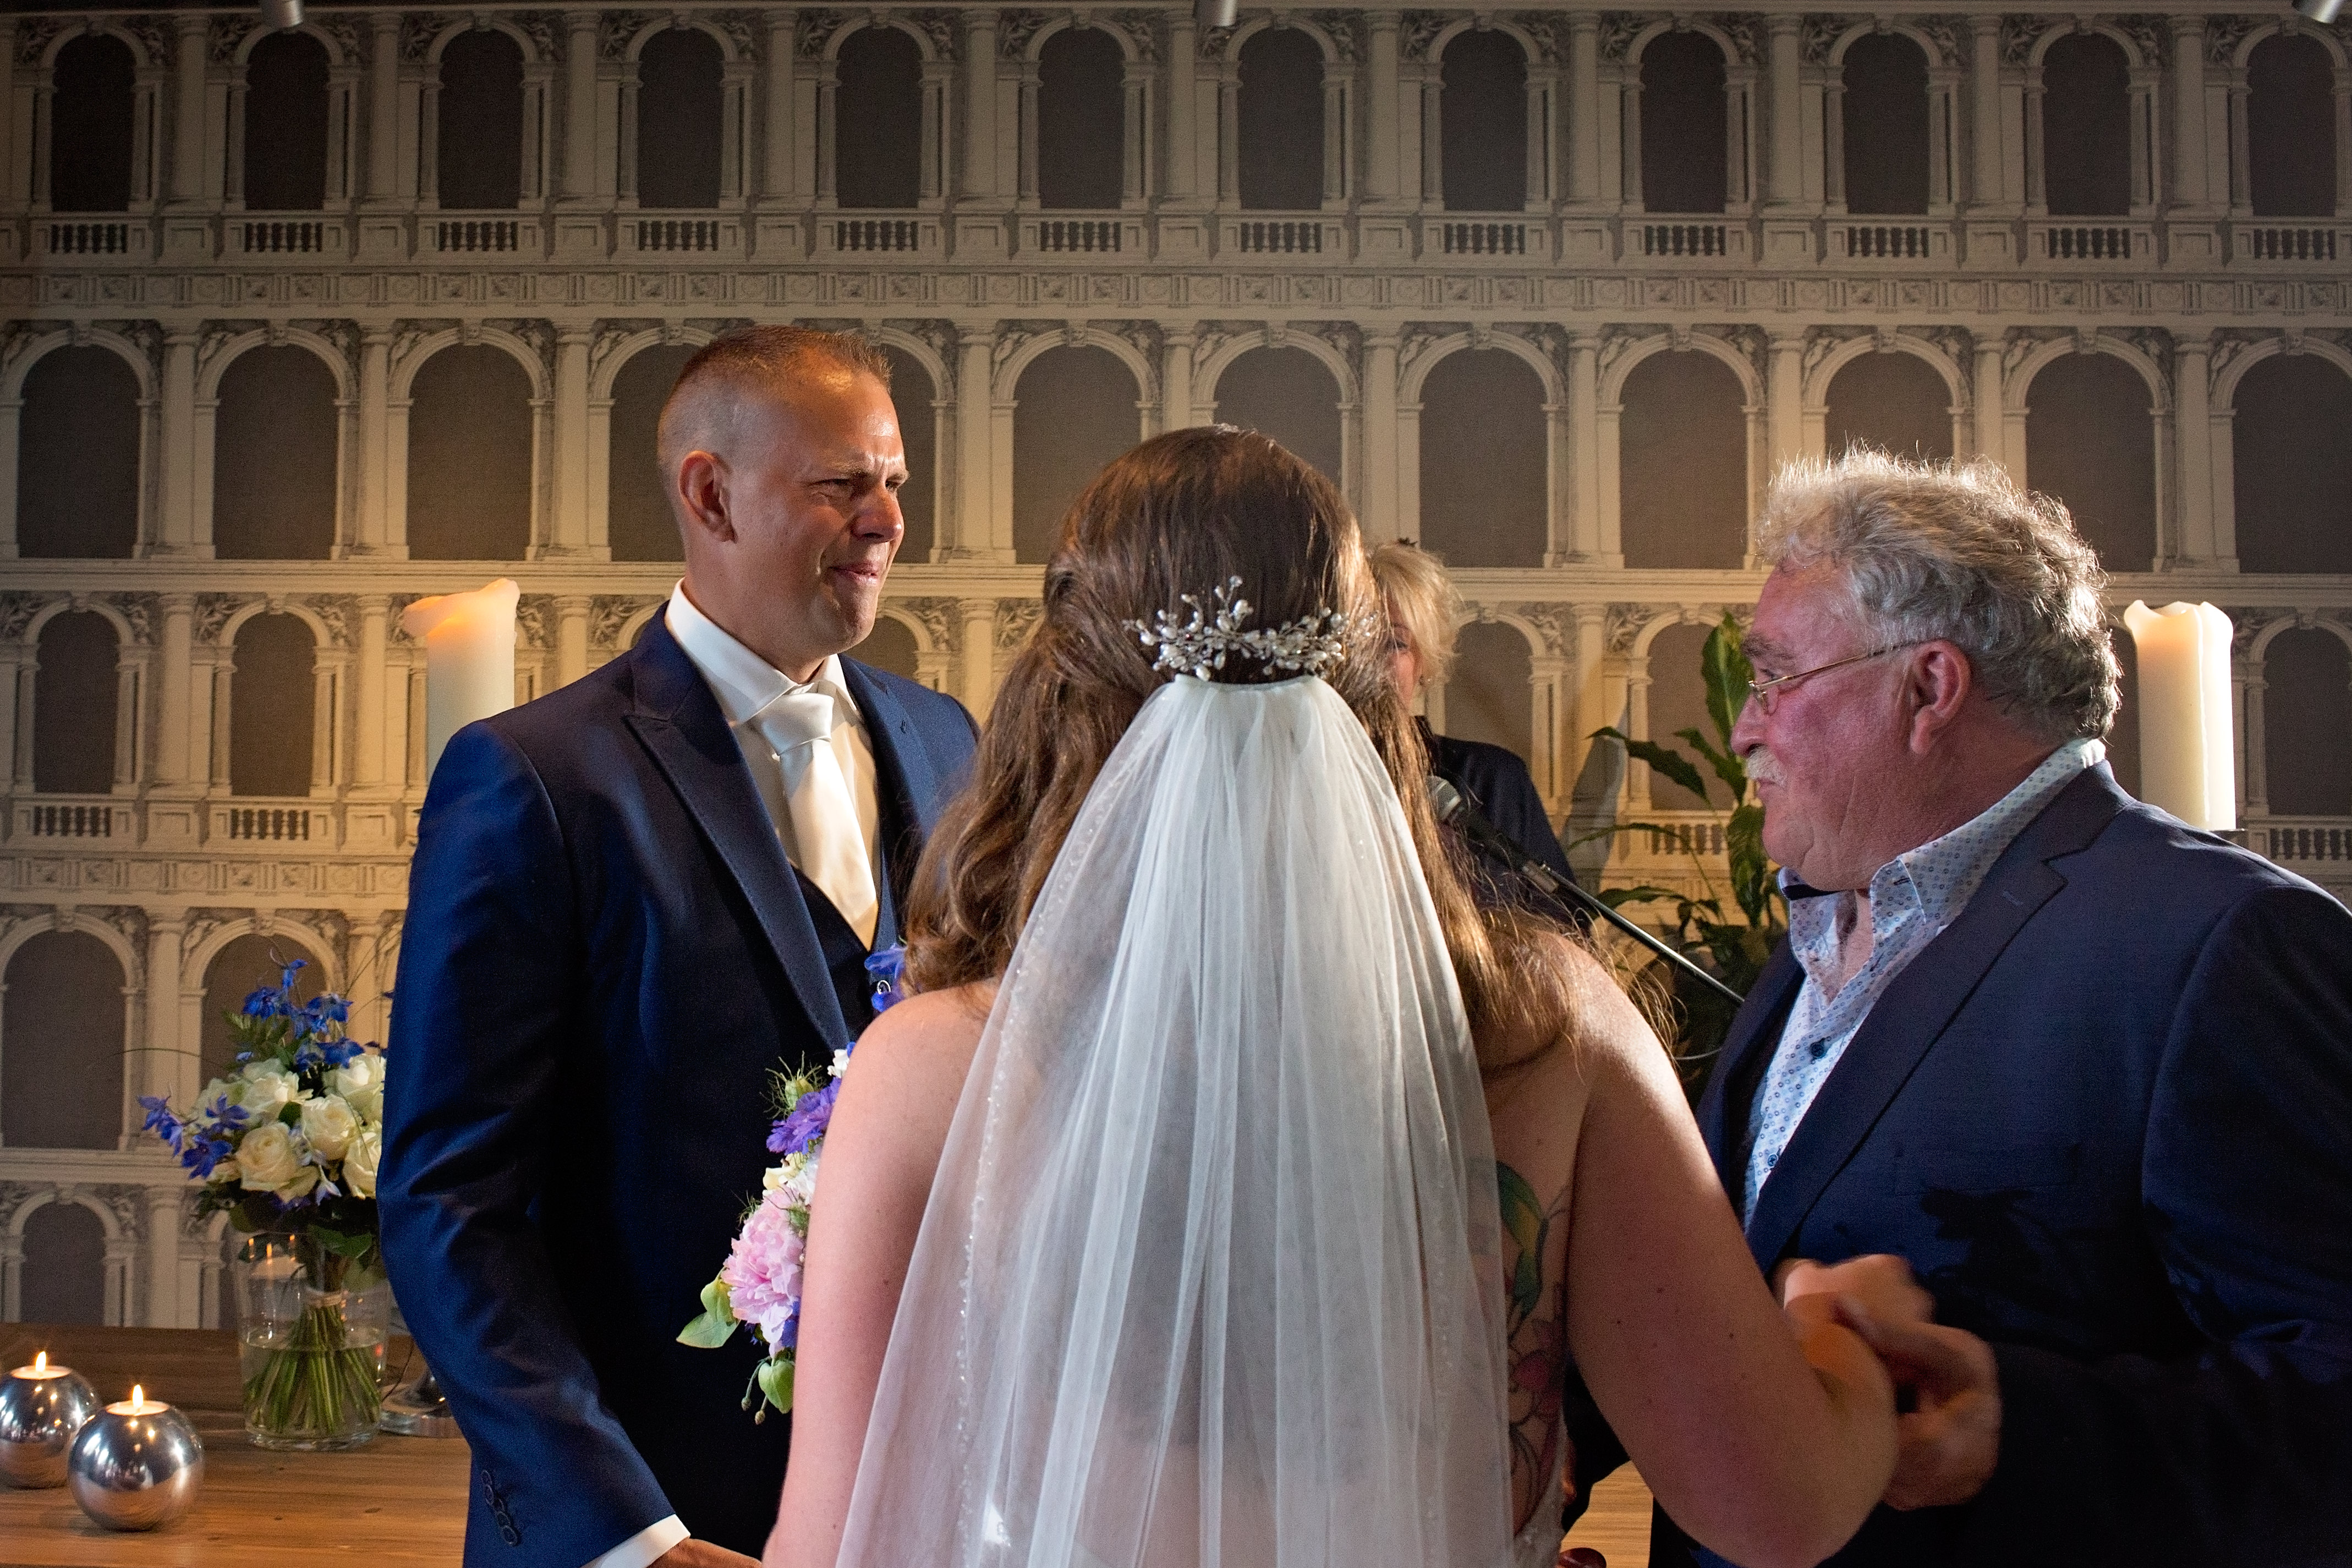 zo'n mooi moment bruidegom in tranen